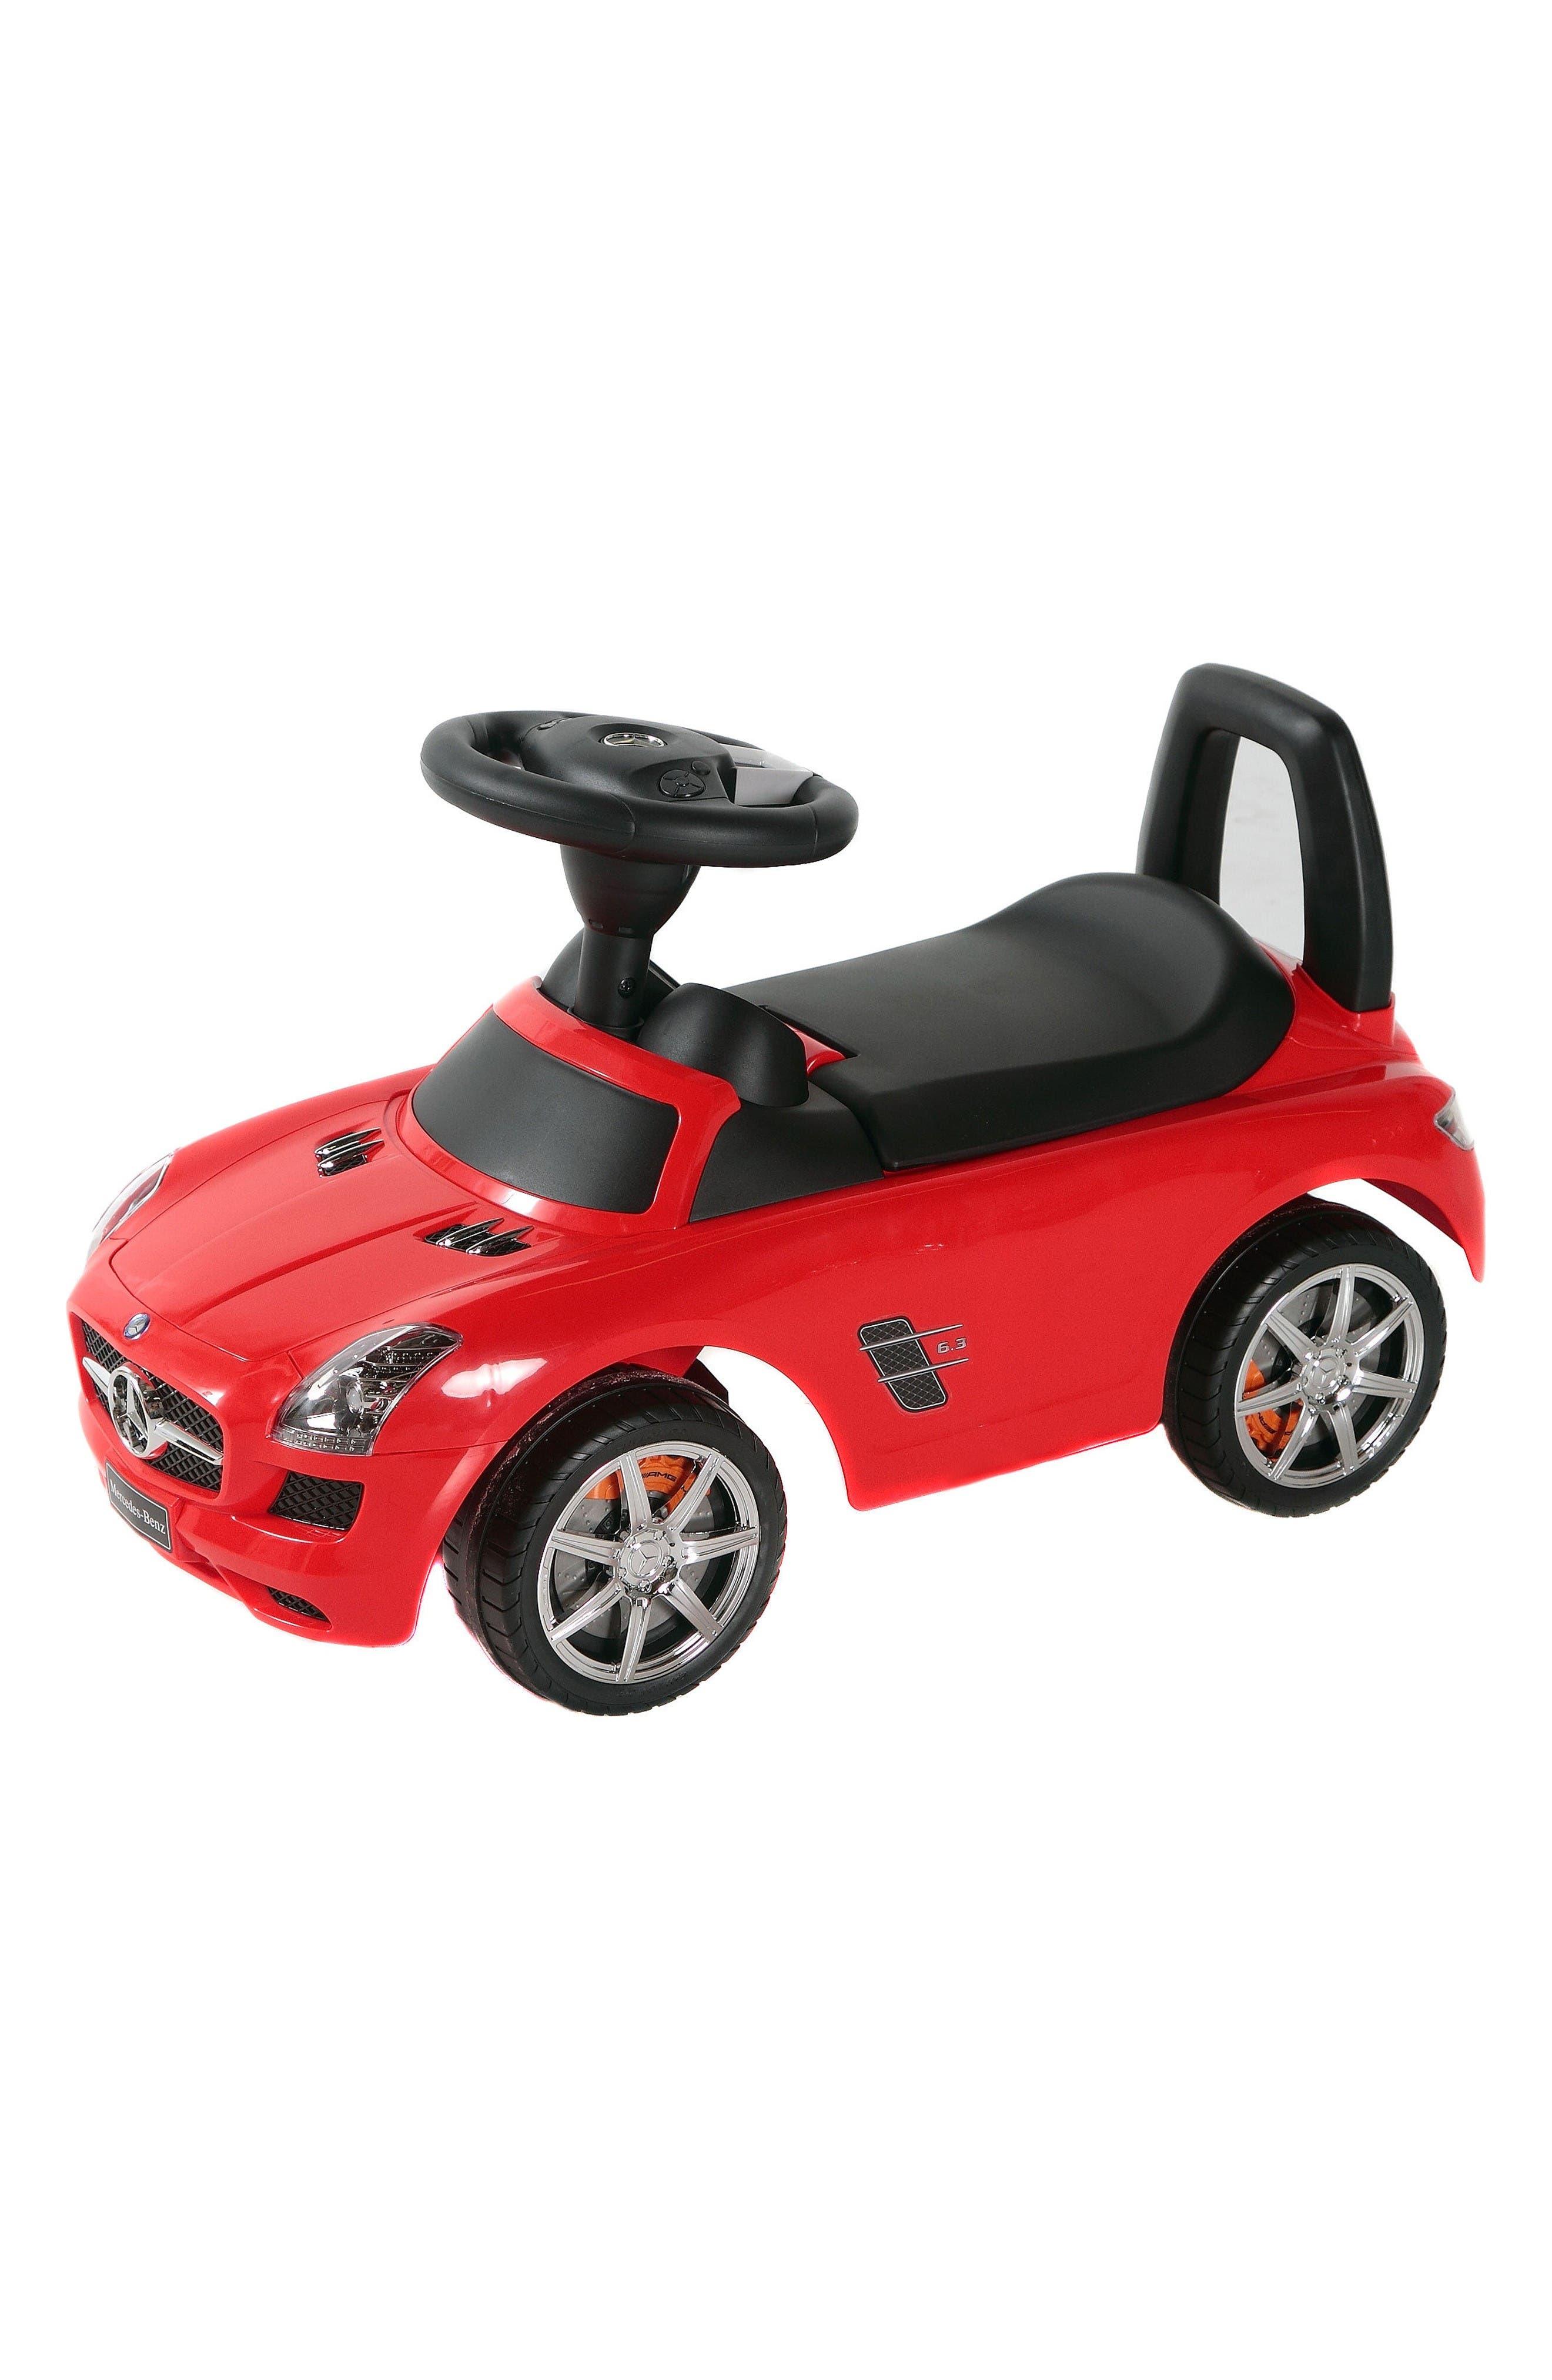 Main Image - Best Ride On Cars Mercedes Push Car